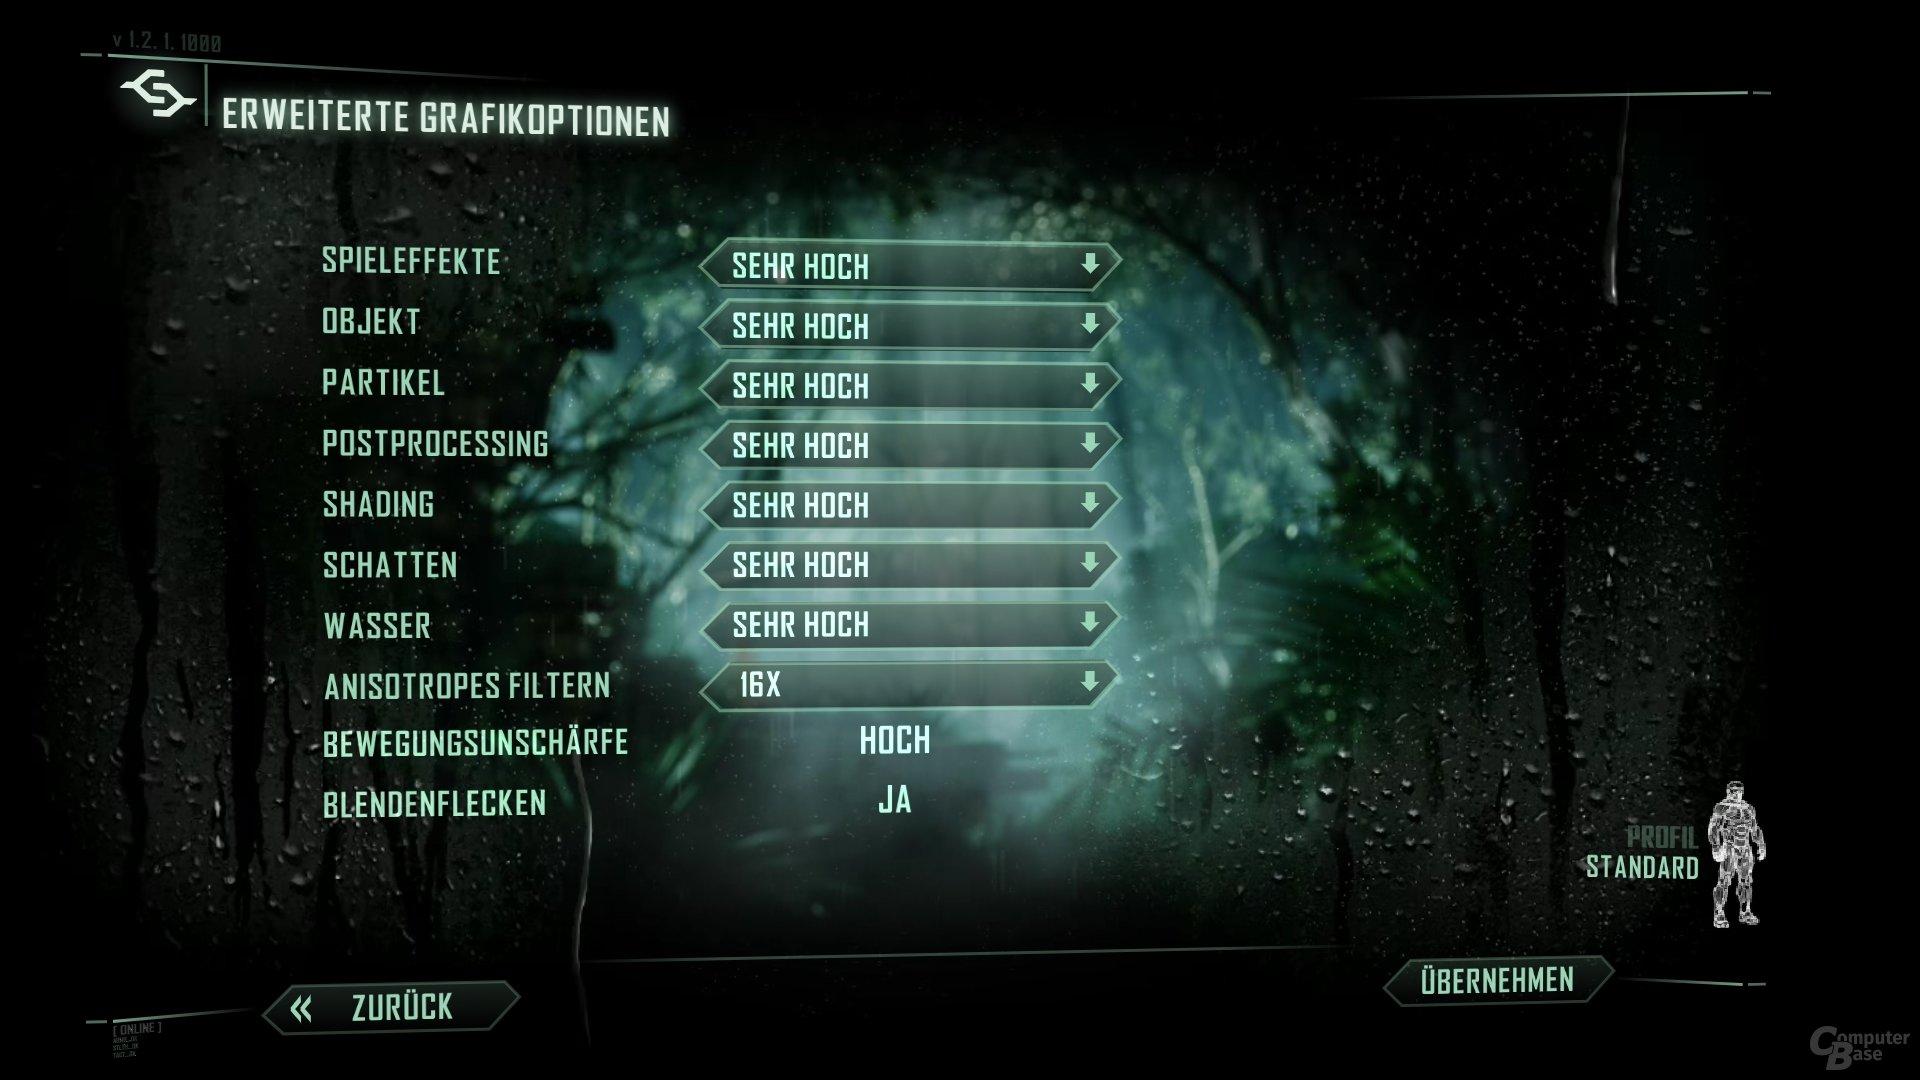 Optimierung bei Crysis 3 fehlgeschlagen